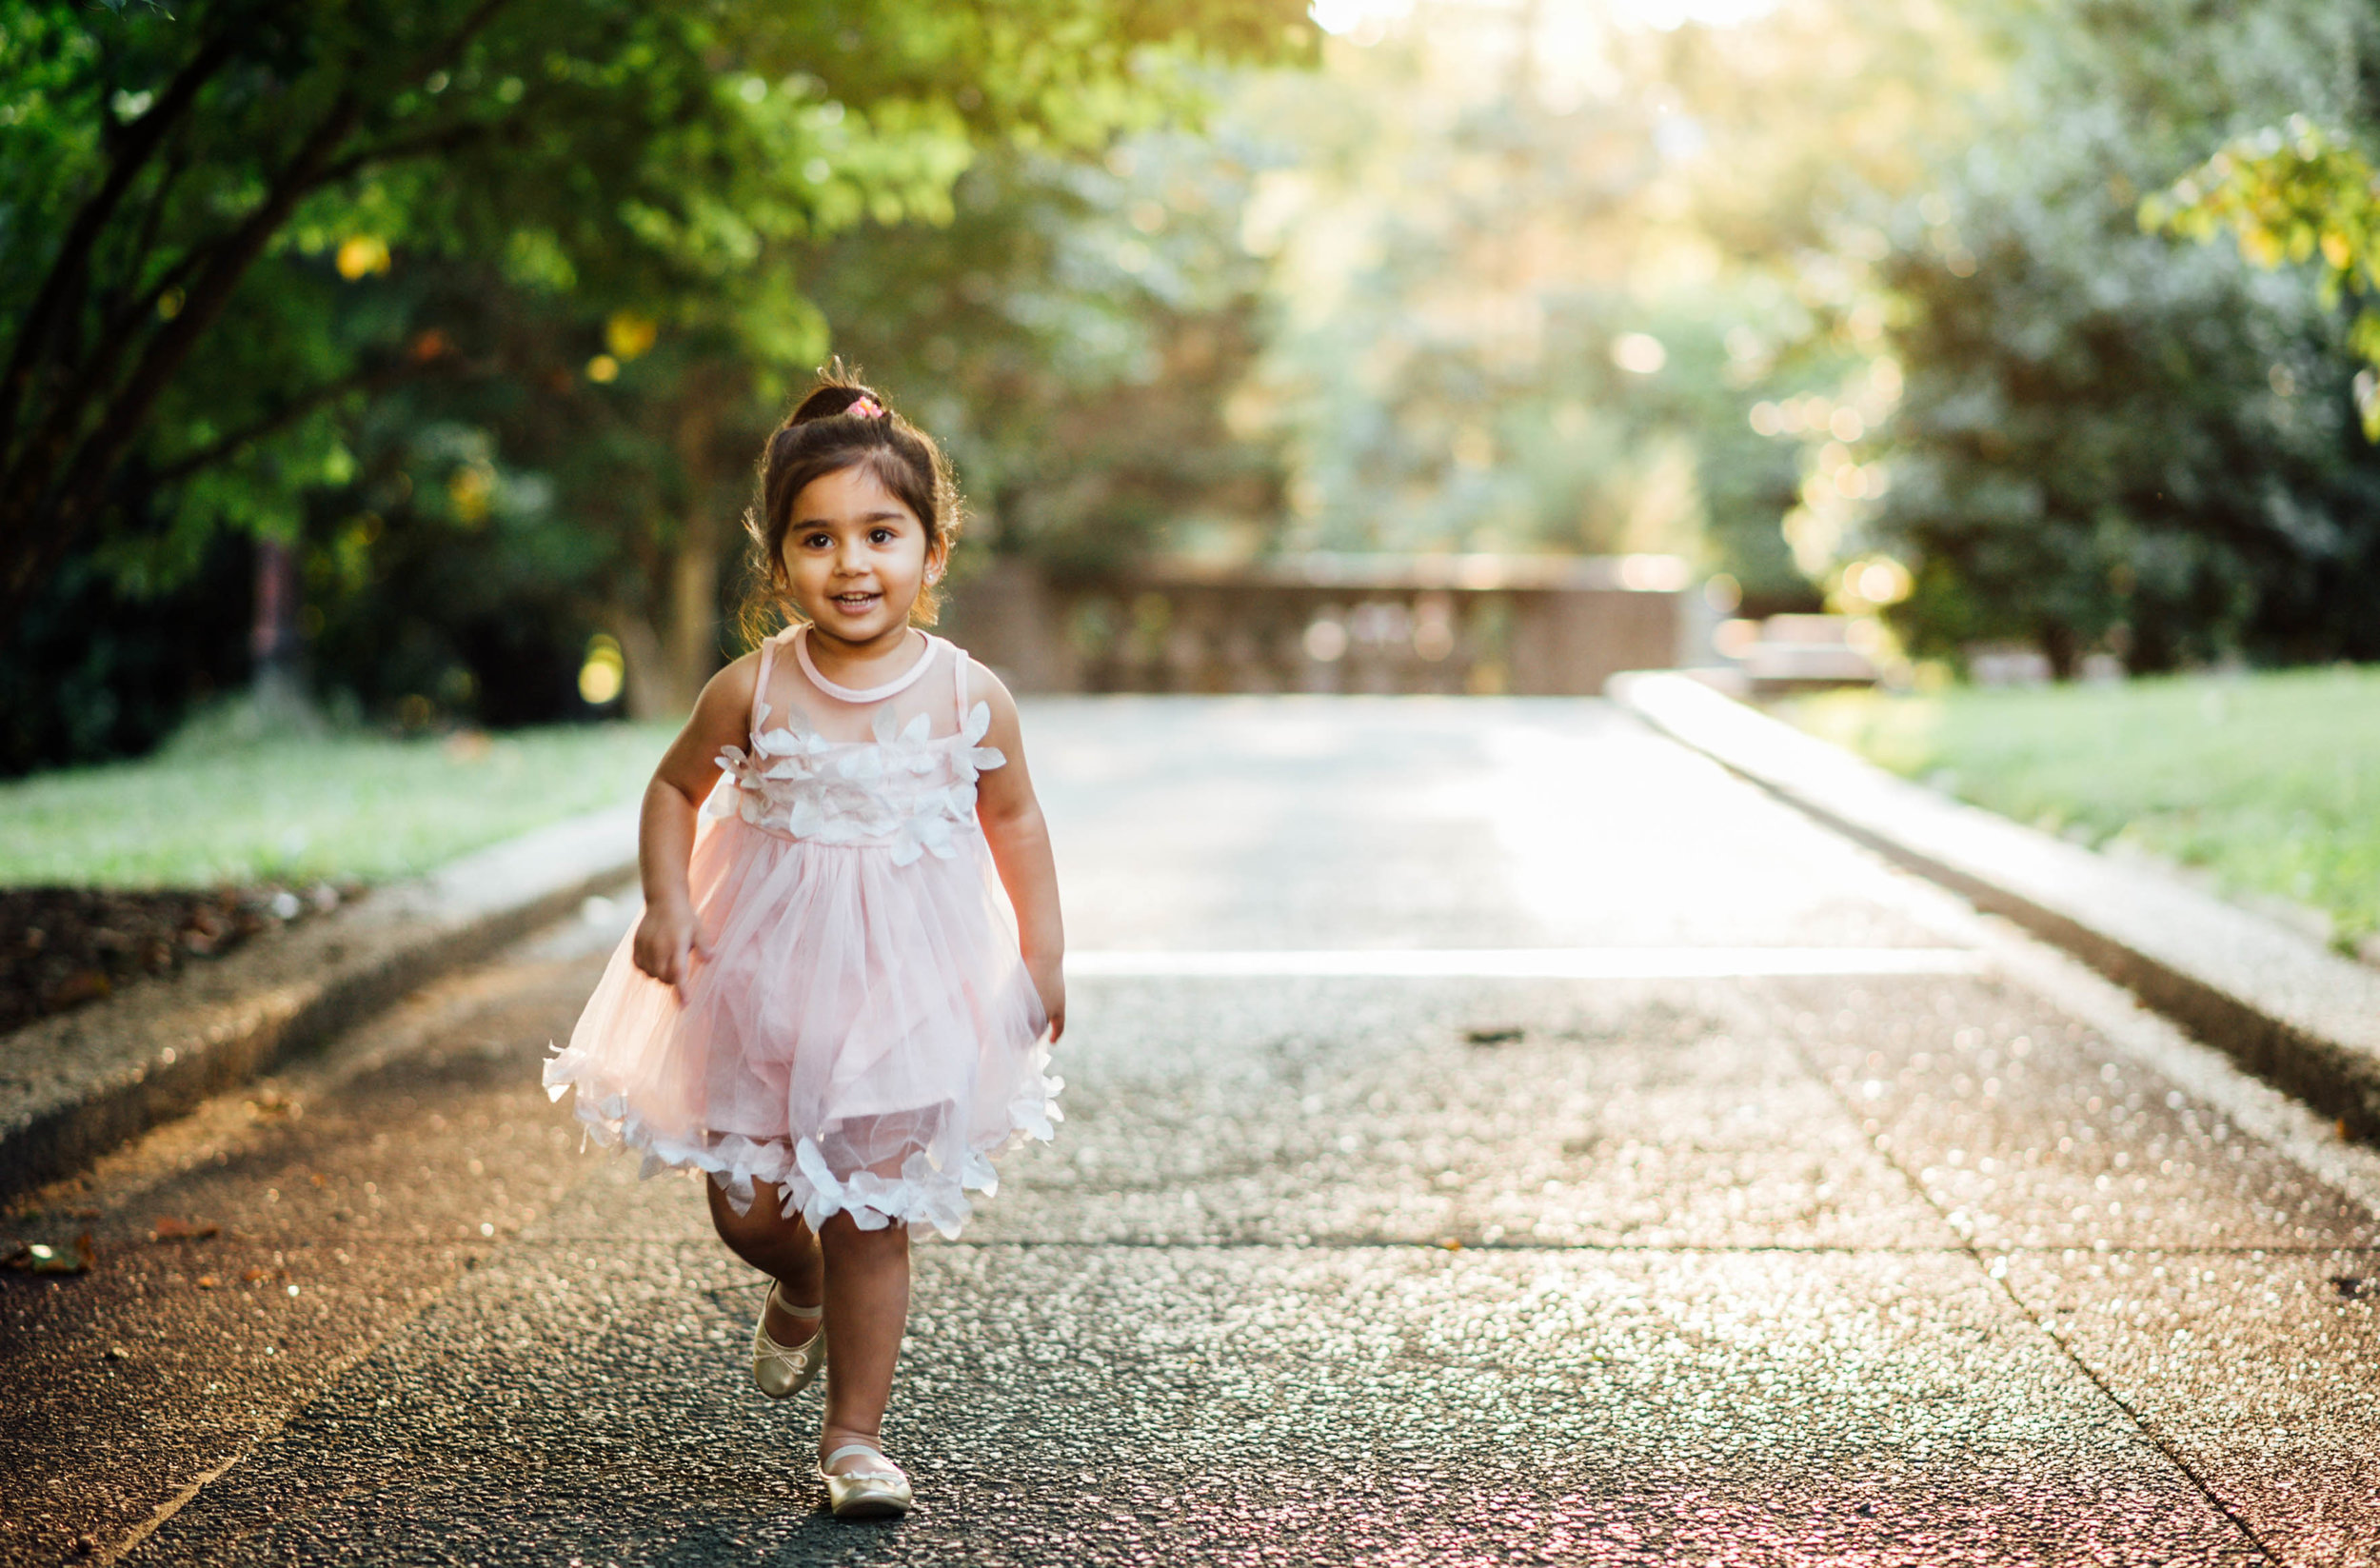 little girl in pink dress running in DC